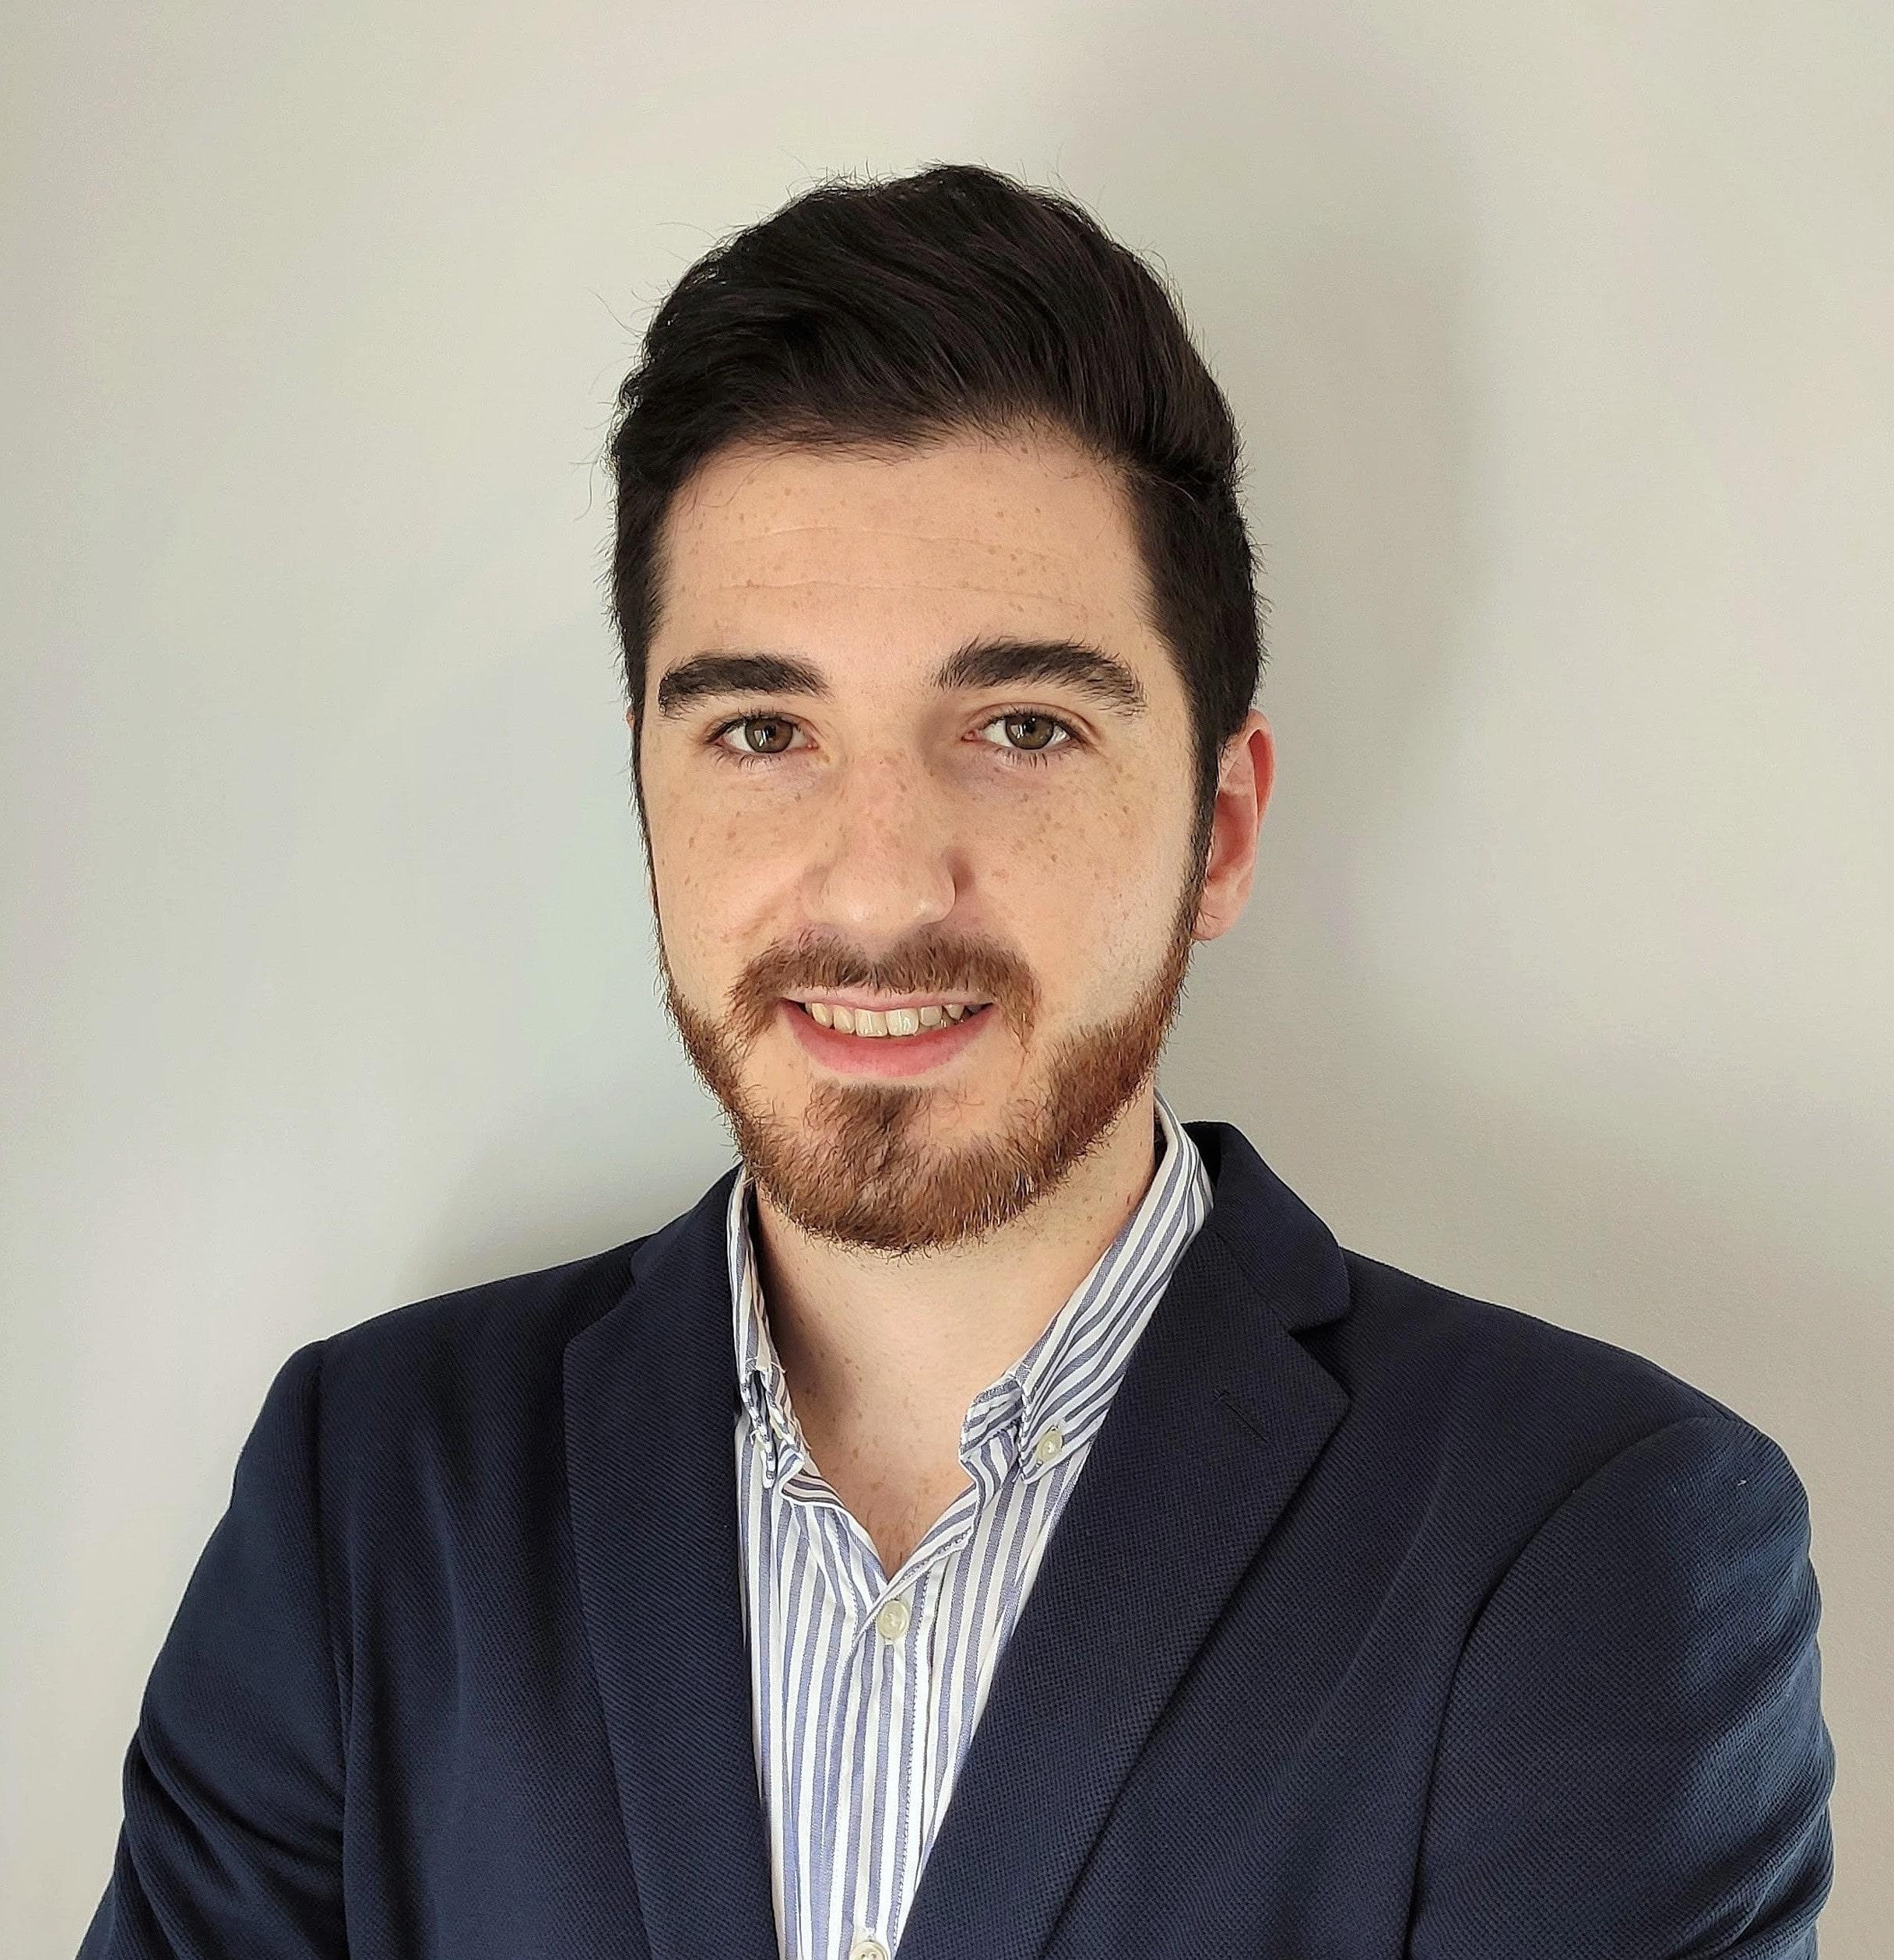 Adrián Pulido